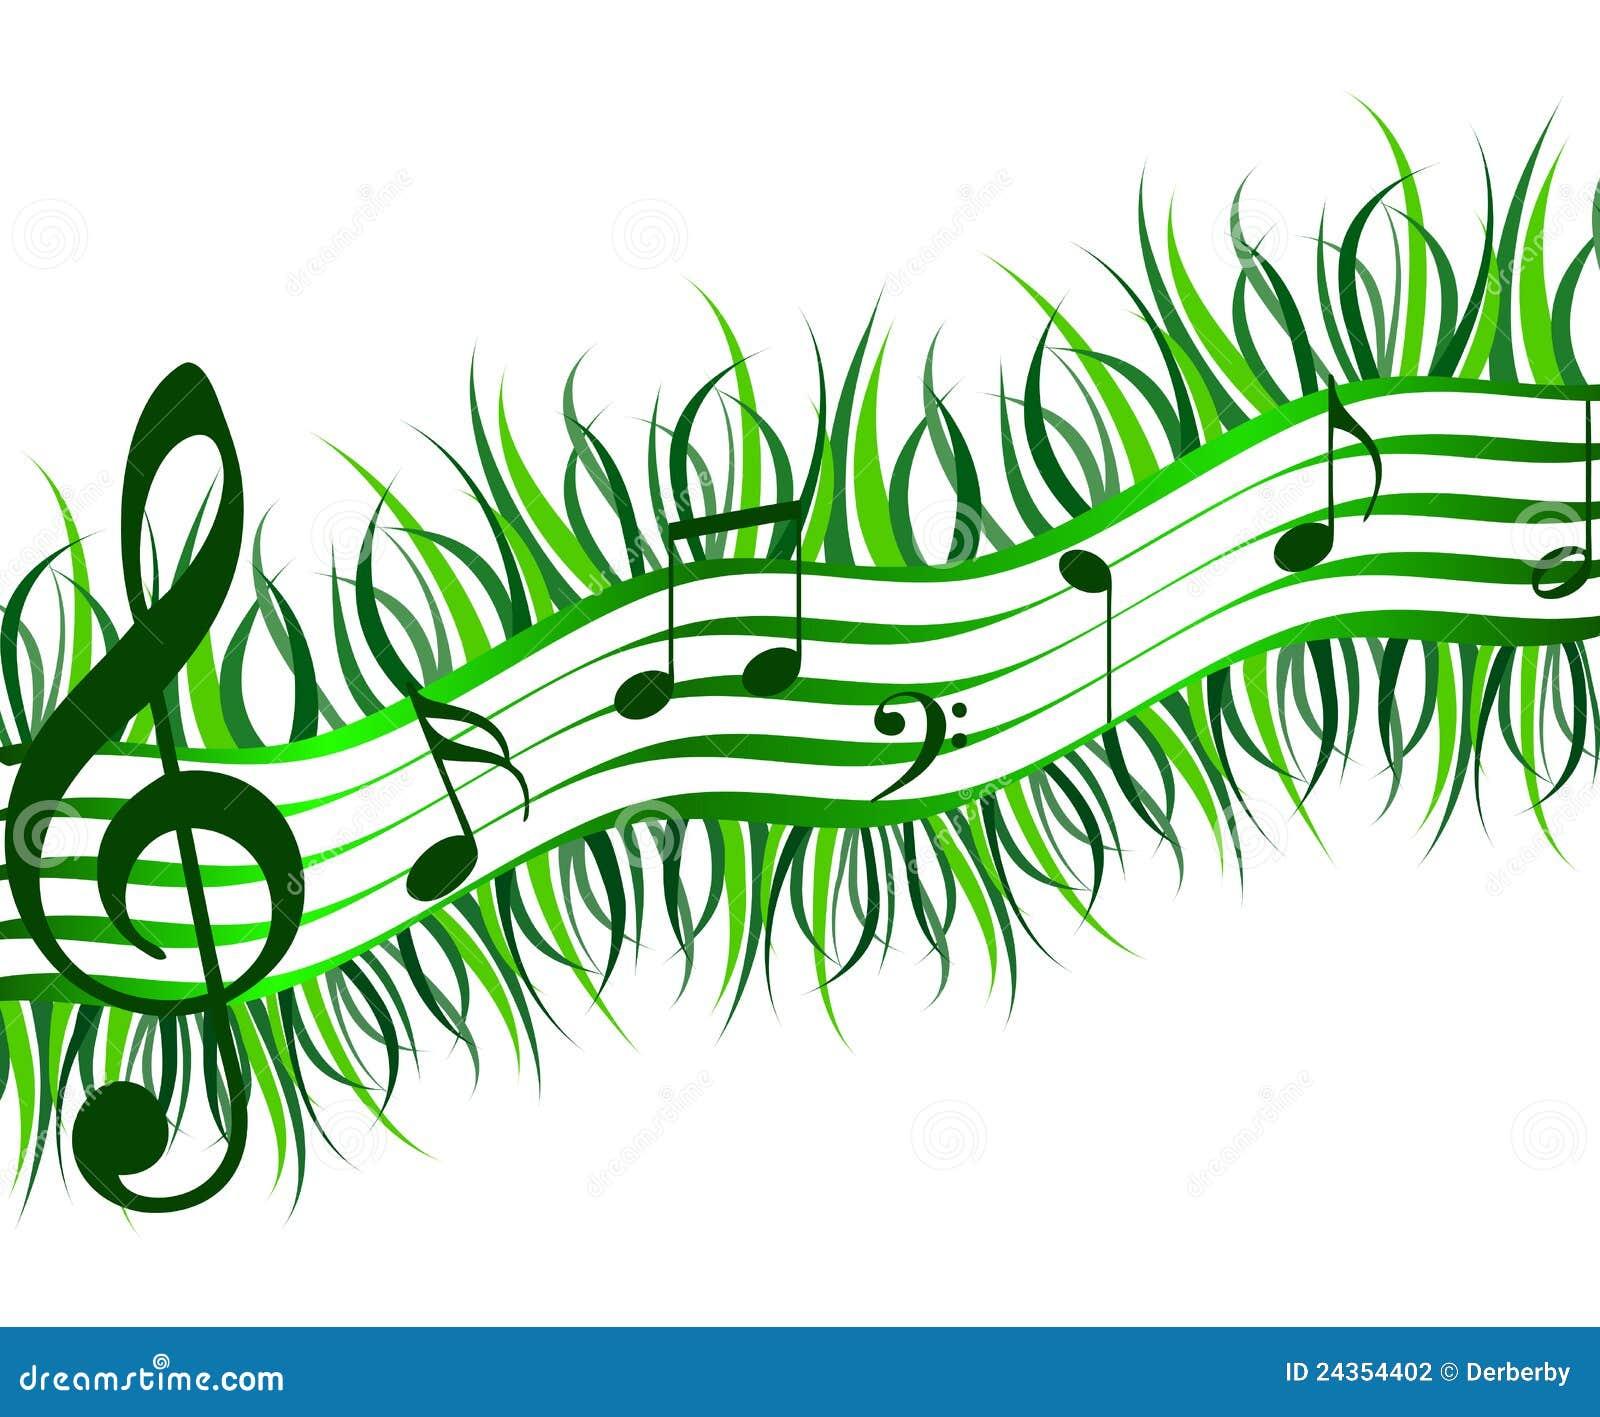 frühlingsmusik